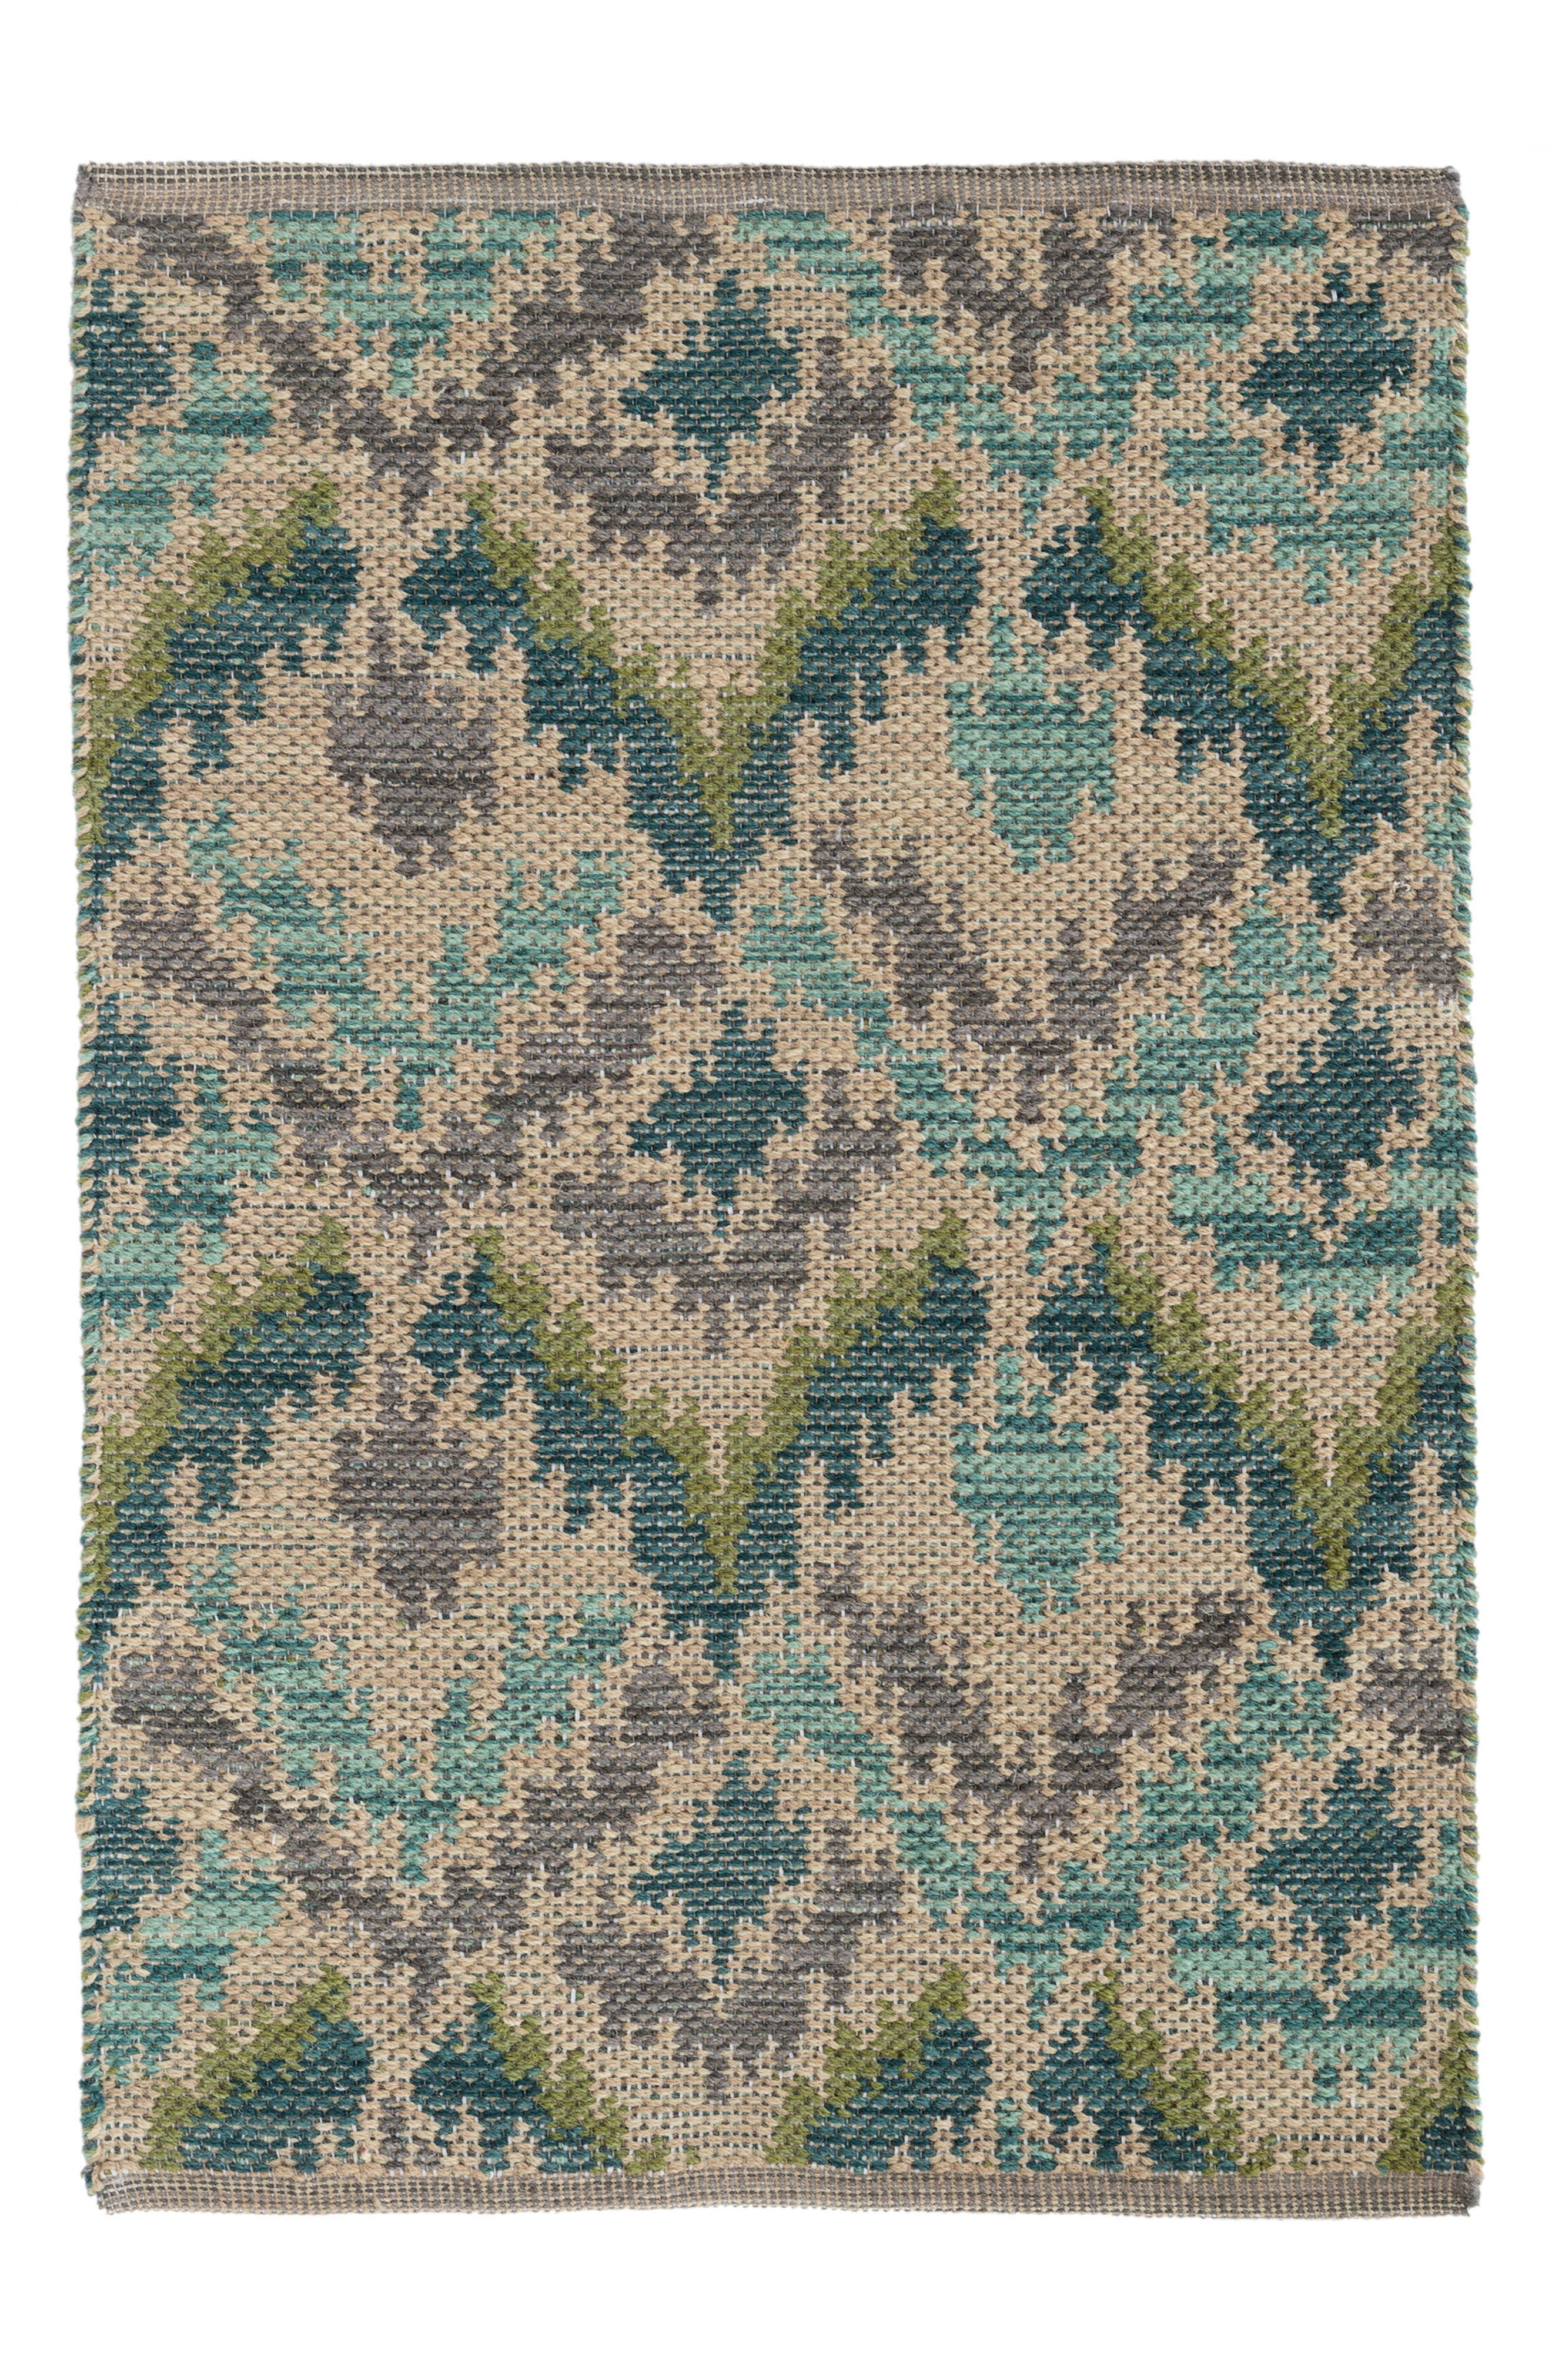 Medina Handwoven Jacquard Rug,                         Main,                         color, GREEN